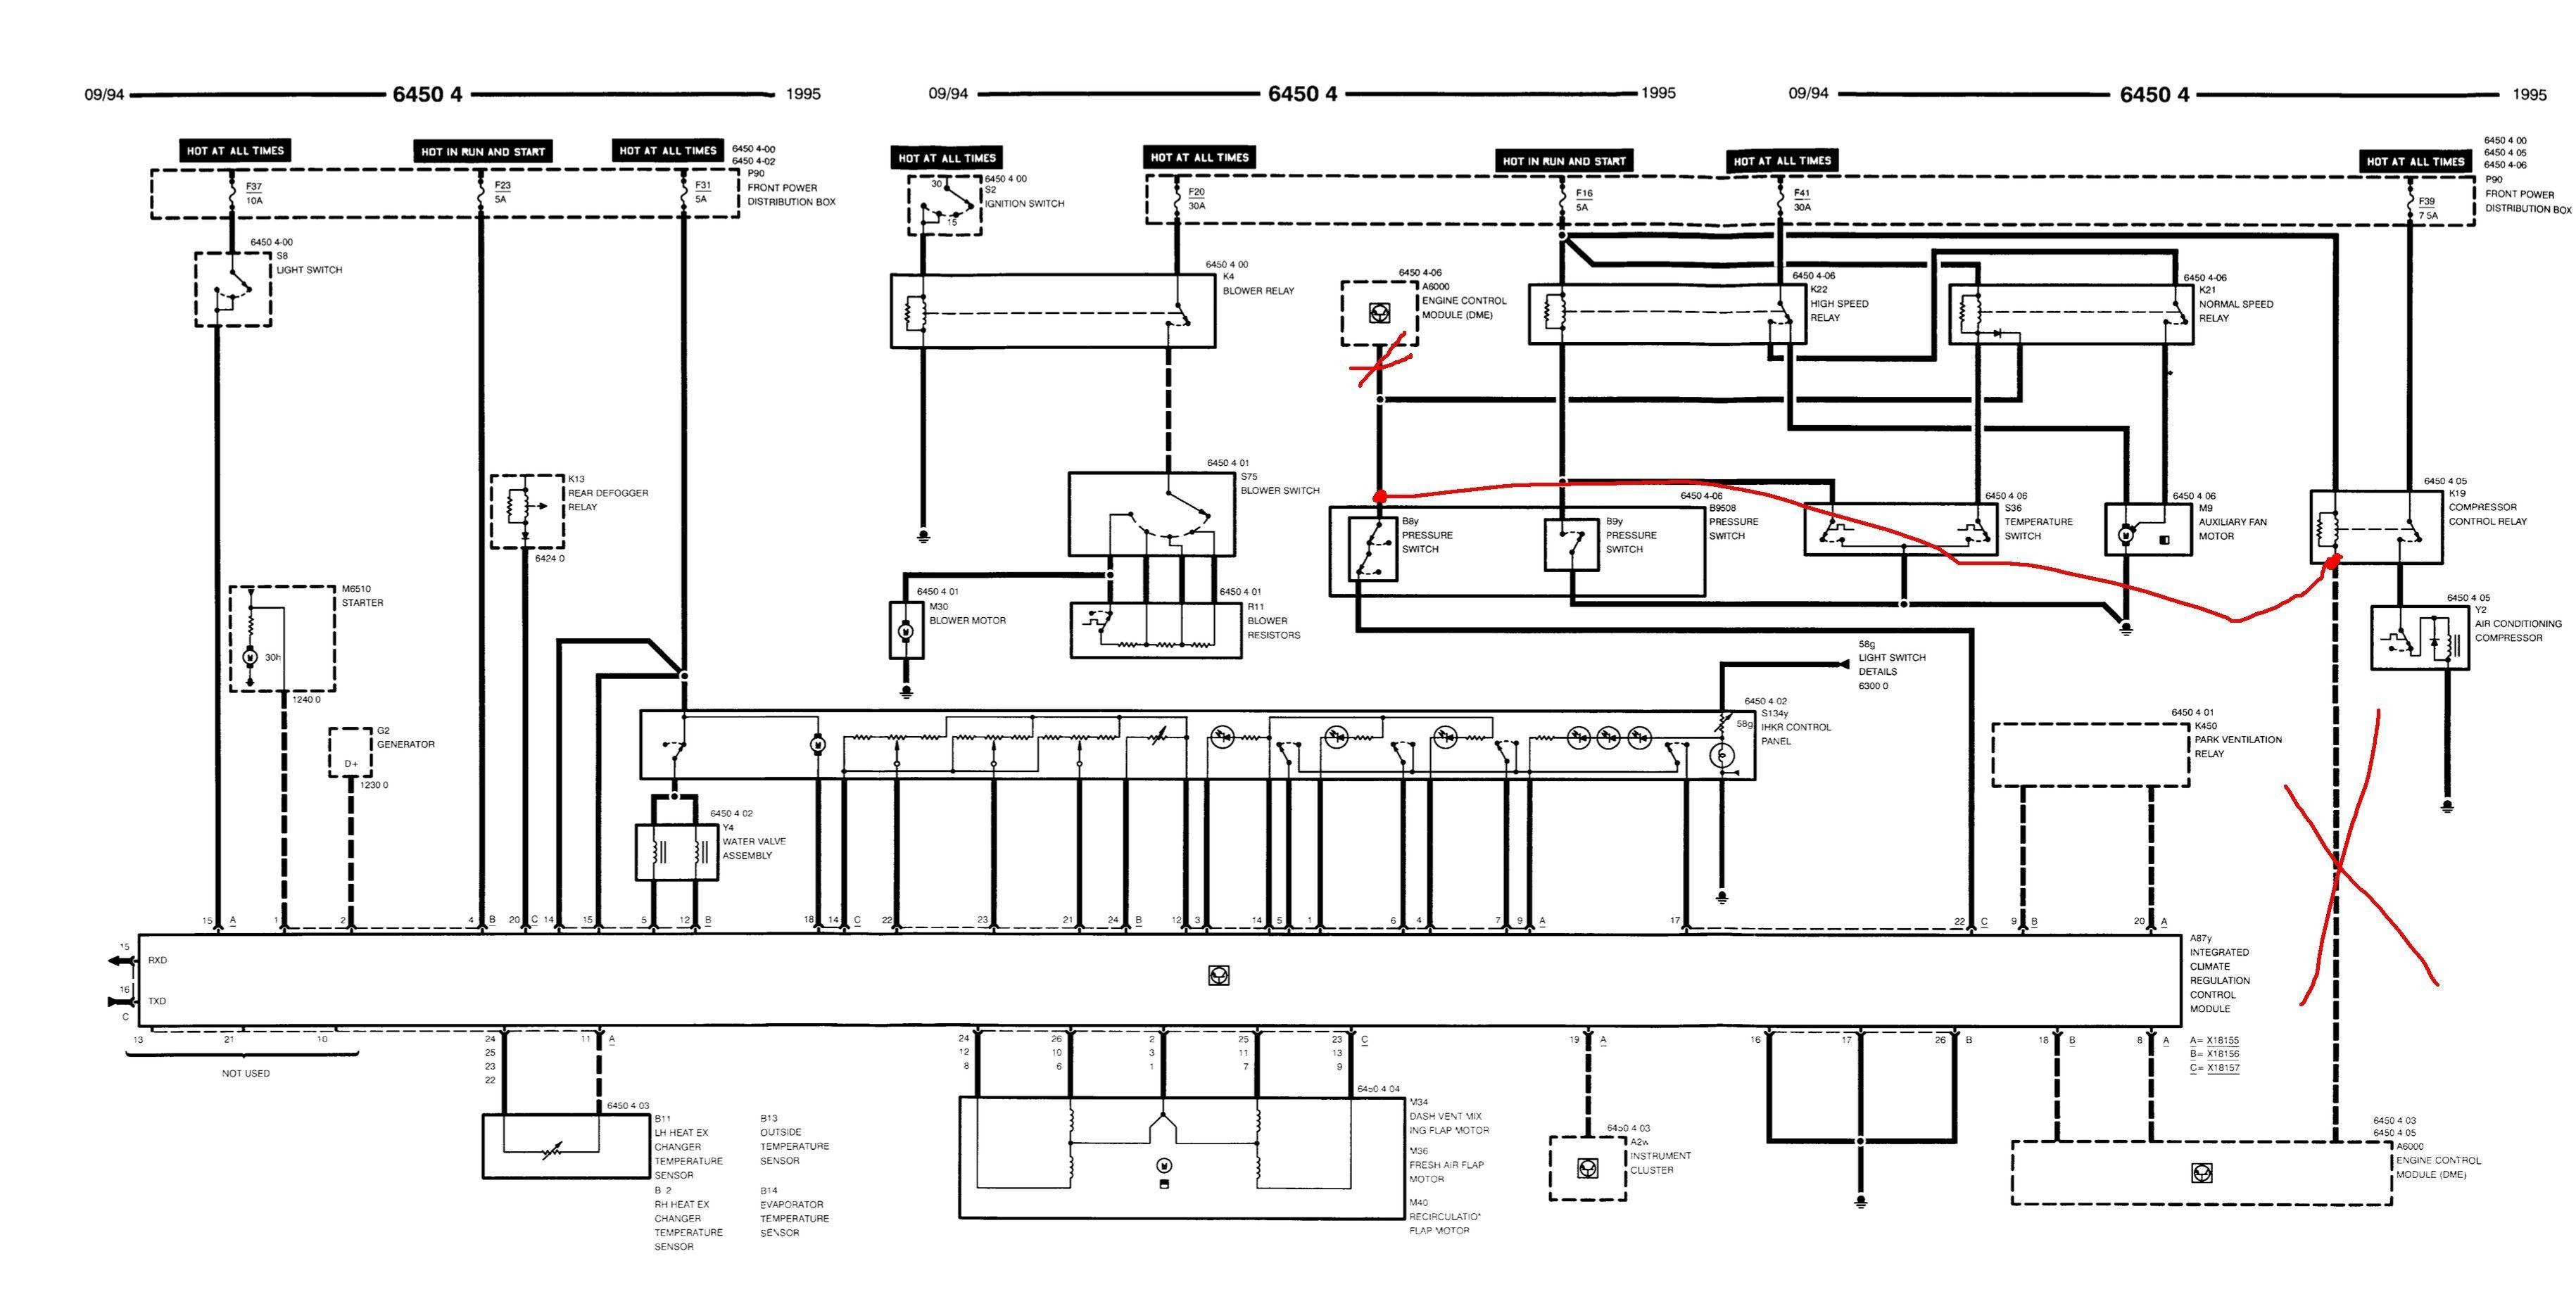 Bmw E46 Ignition Switch Wiring Diagram Diagram Diagramtemplate Diagramsample Bmw E46 Bmw E30 New Bmw